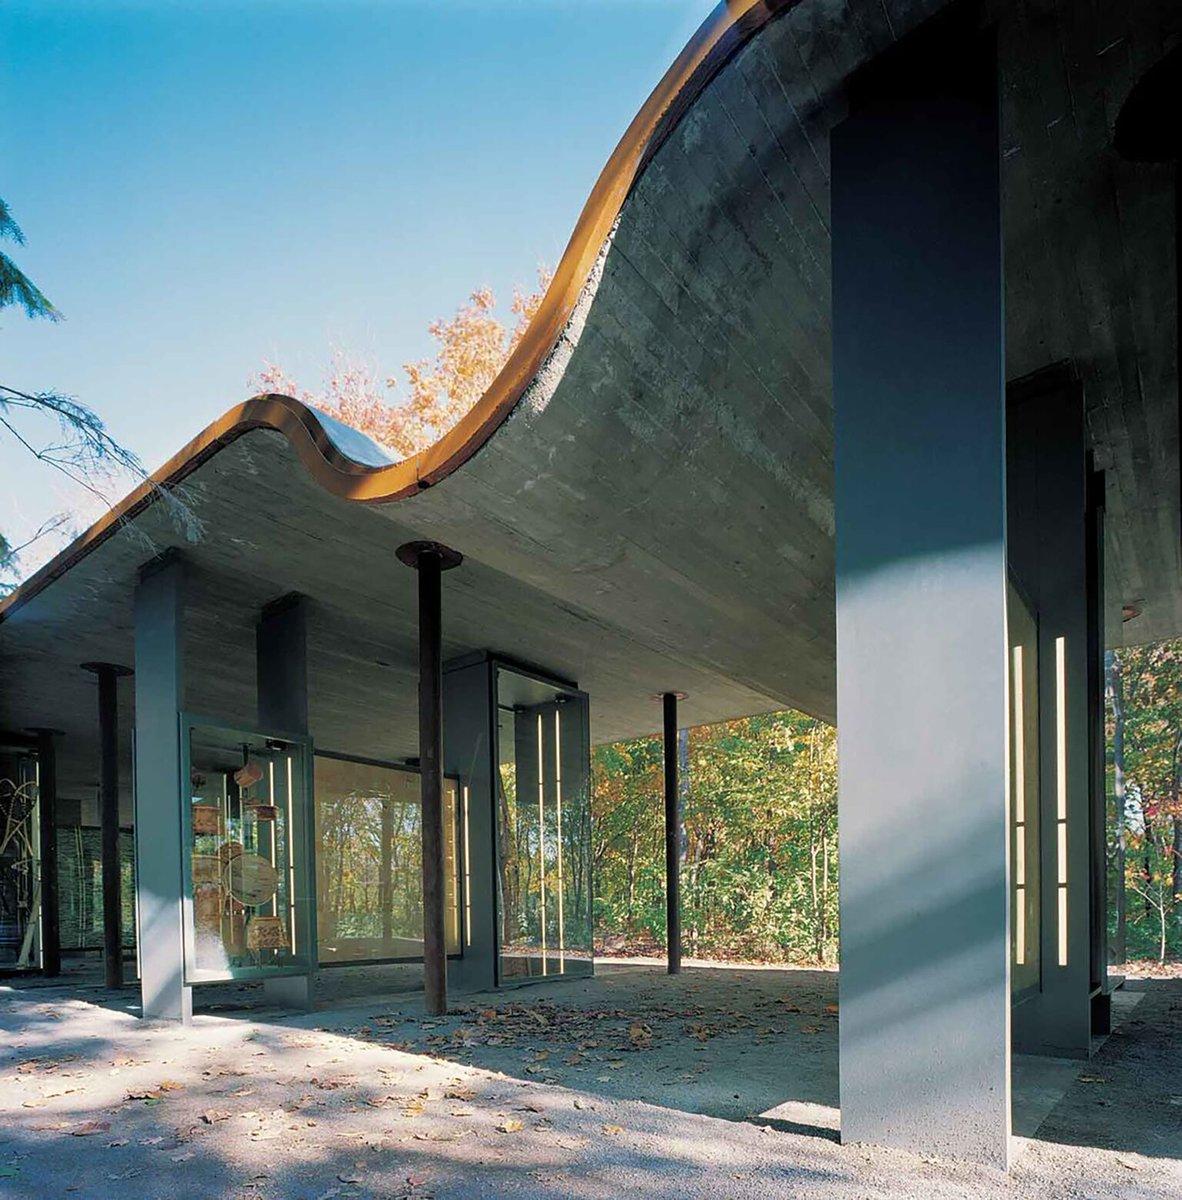 architecture aw raics innovation - HD1009×1024